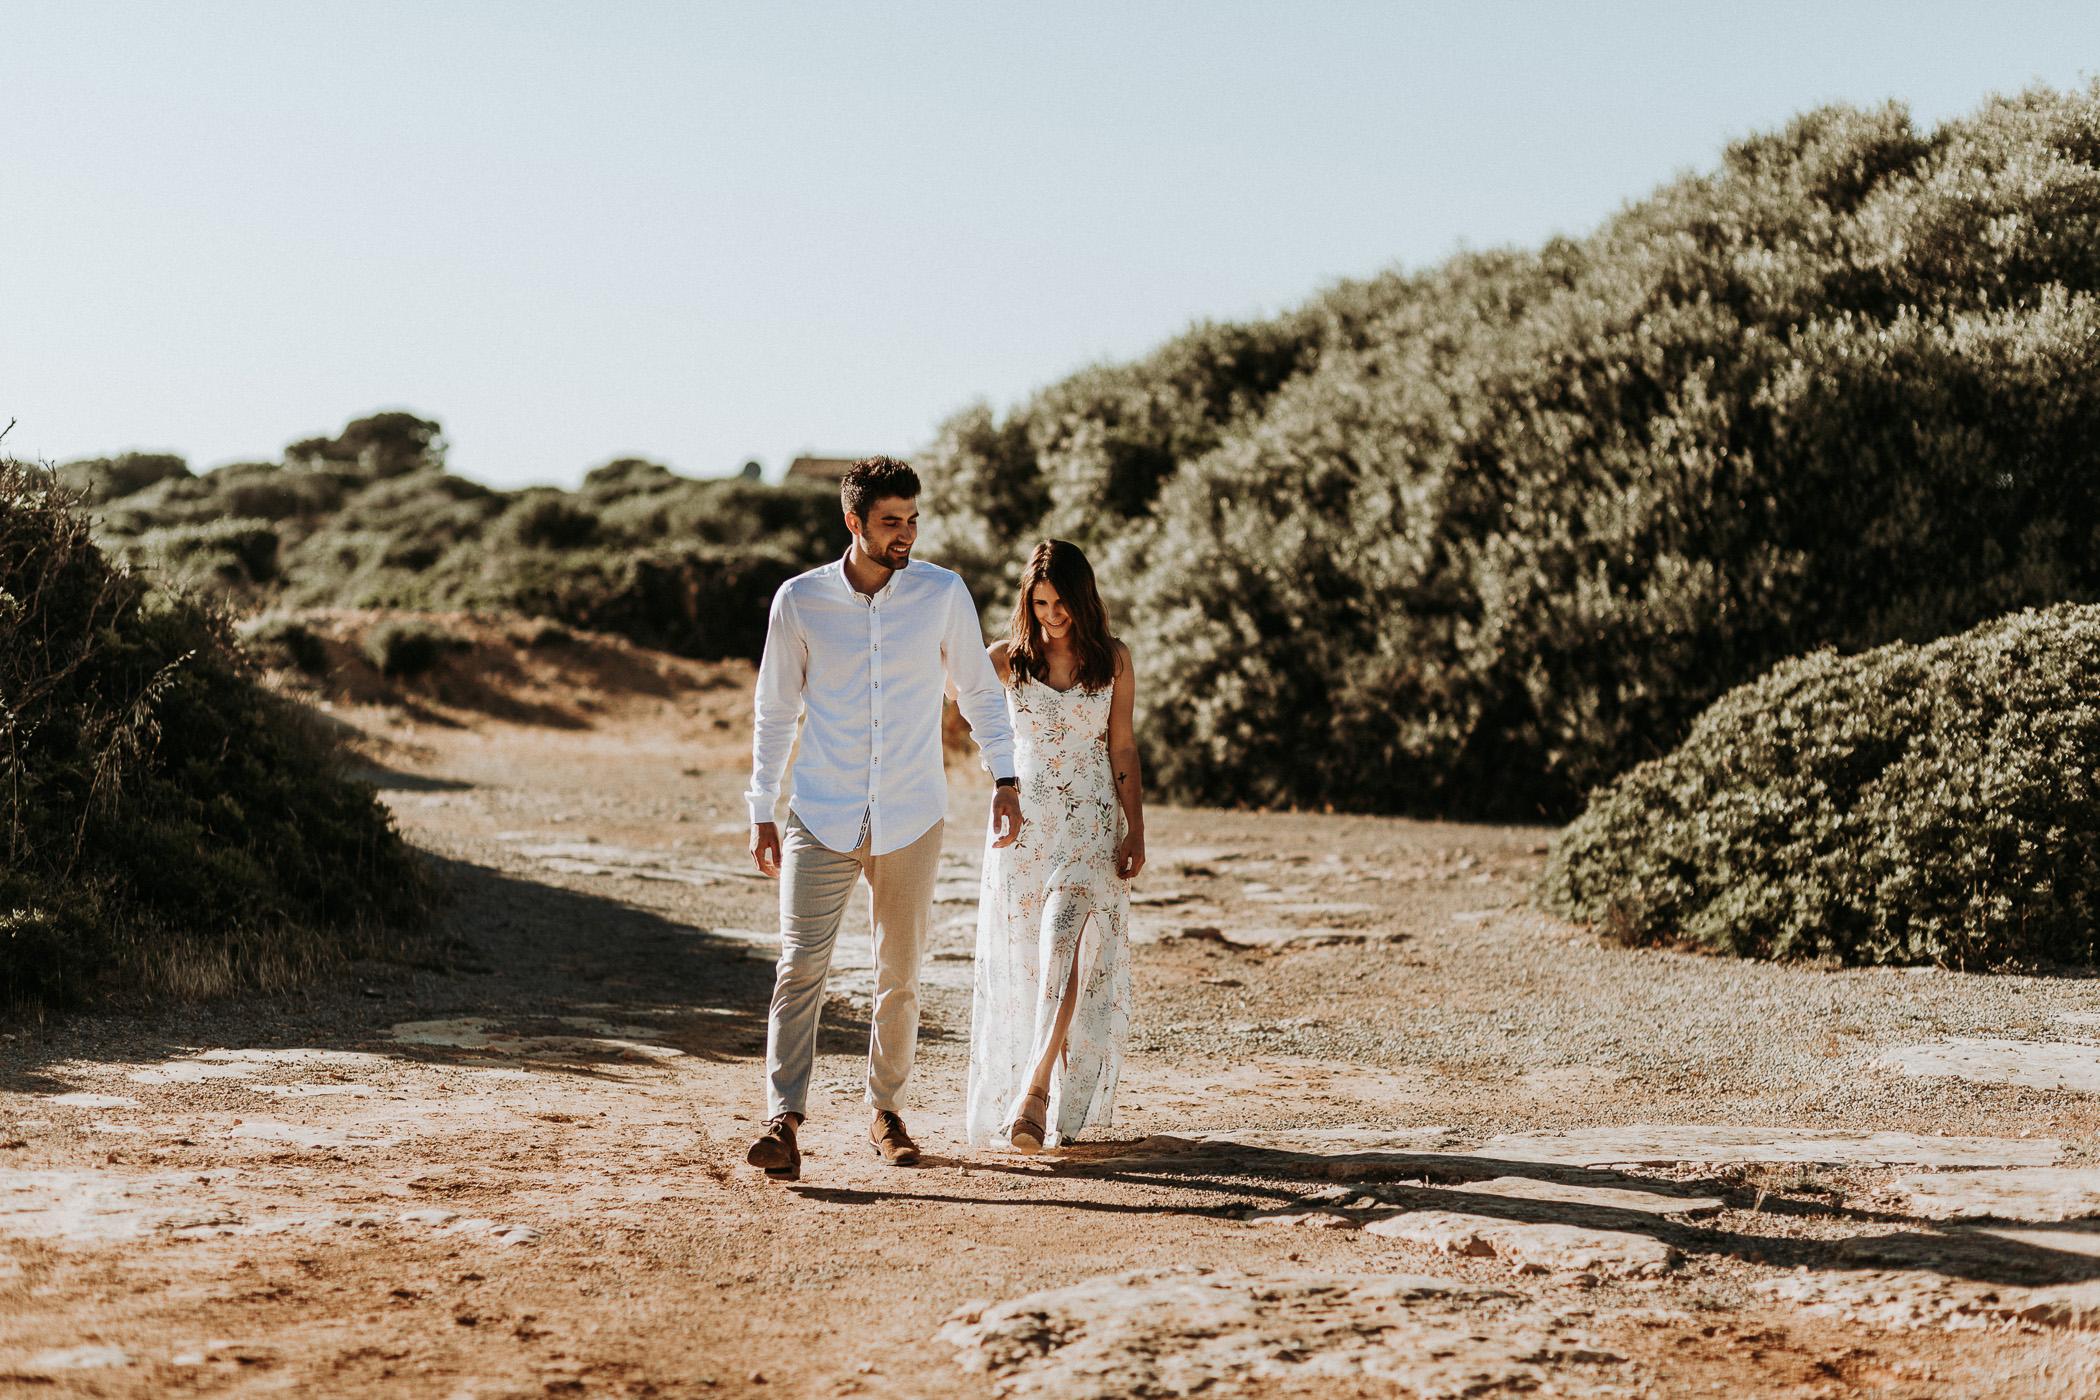 DanielaMarquardtPhotography_wedding_elopement_mallorca_spain_calapi_palma_lauraandtoni_159